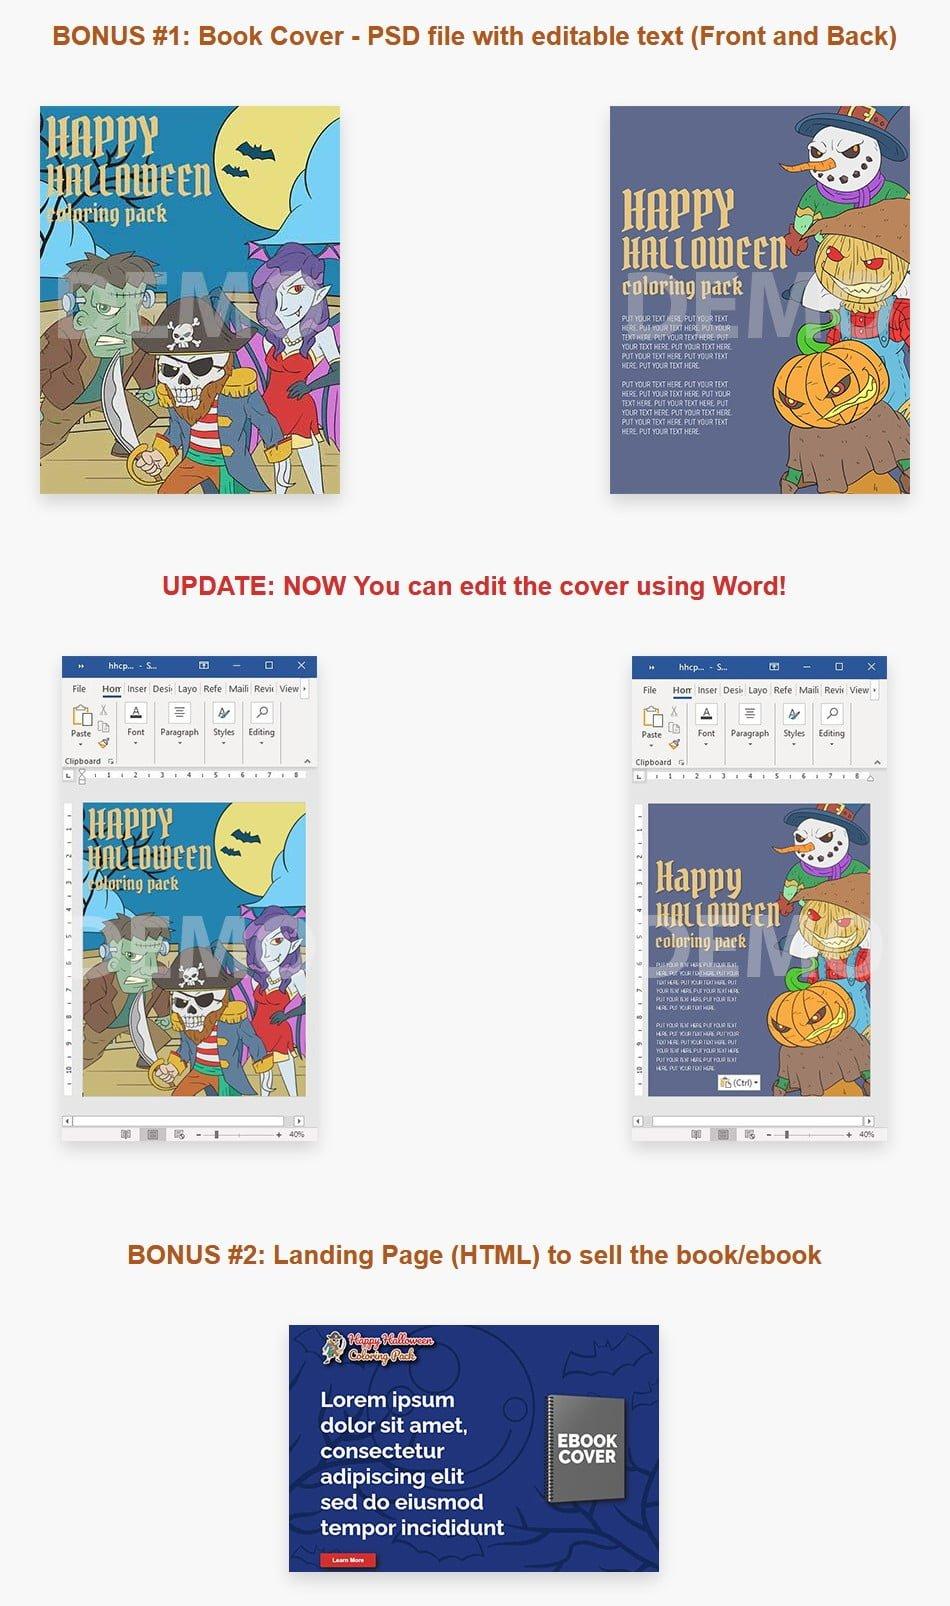 Happy-Halloween-Coloring-Pack-bonus